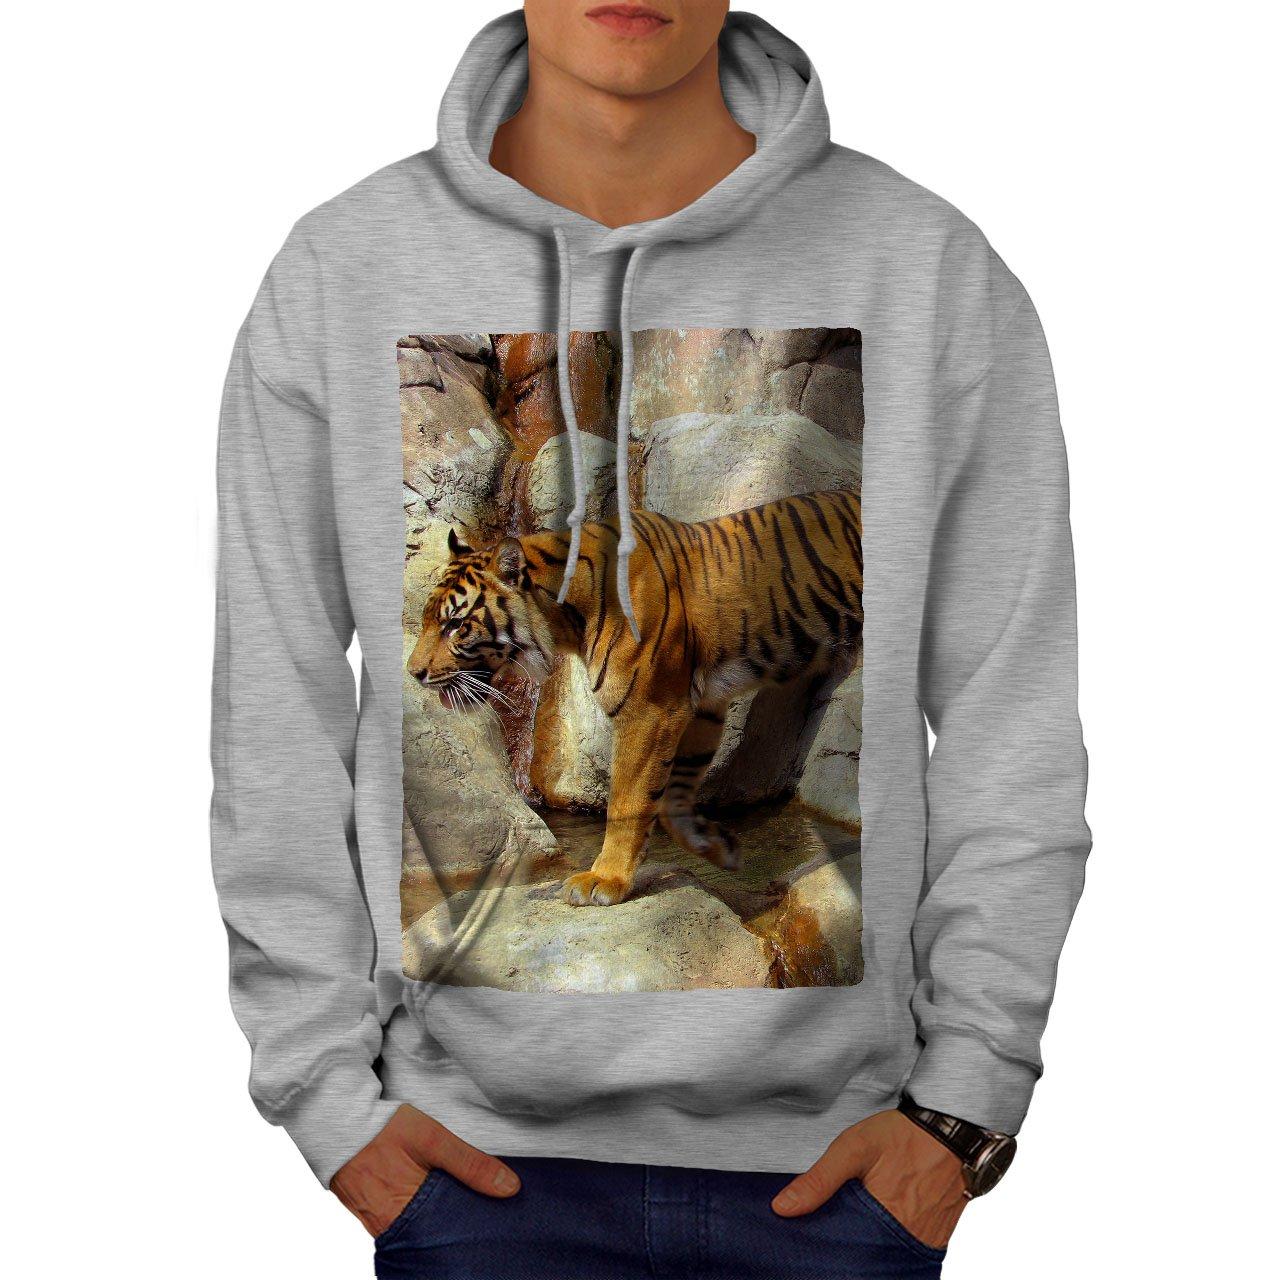 wellcoda Tiger Rock Photo Animal Mens Hoodie Cool Hooded Sweatshirt